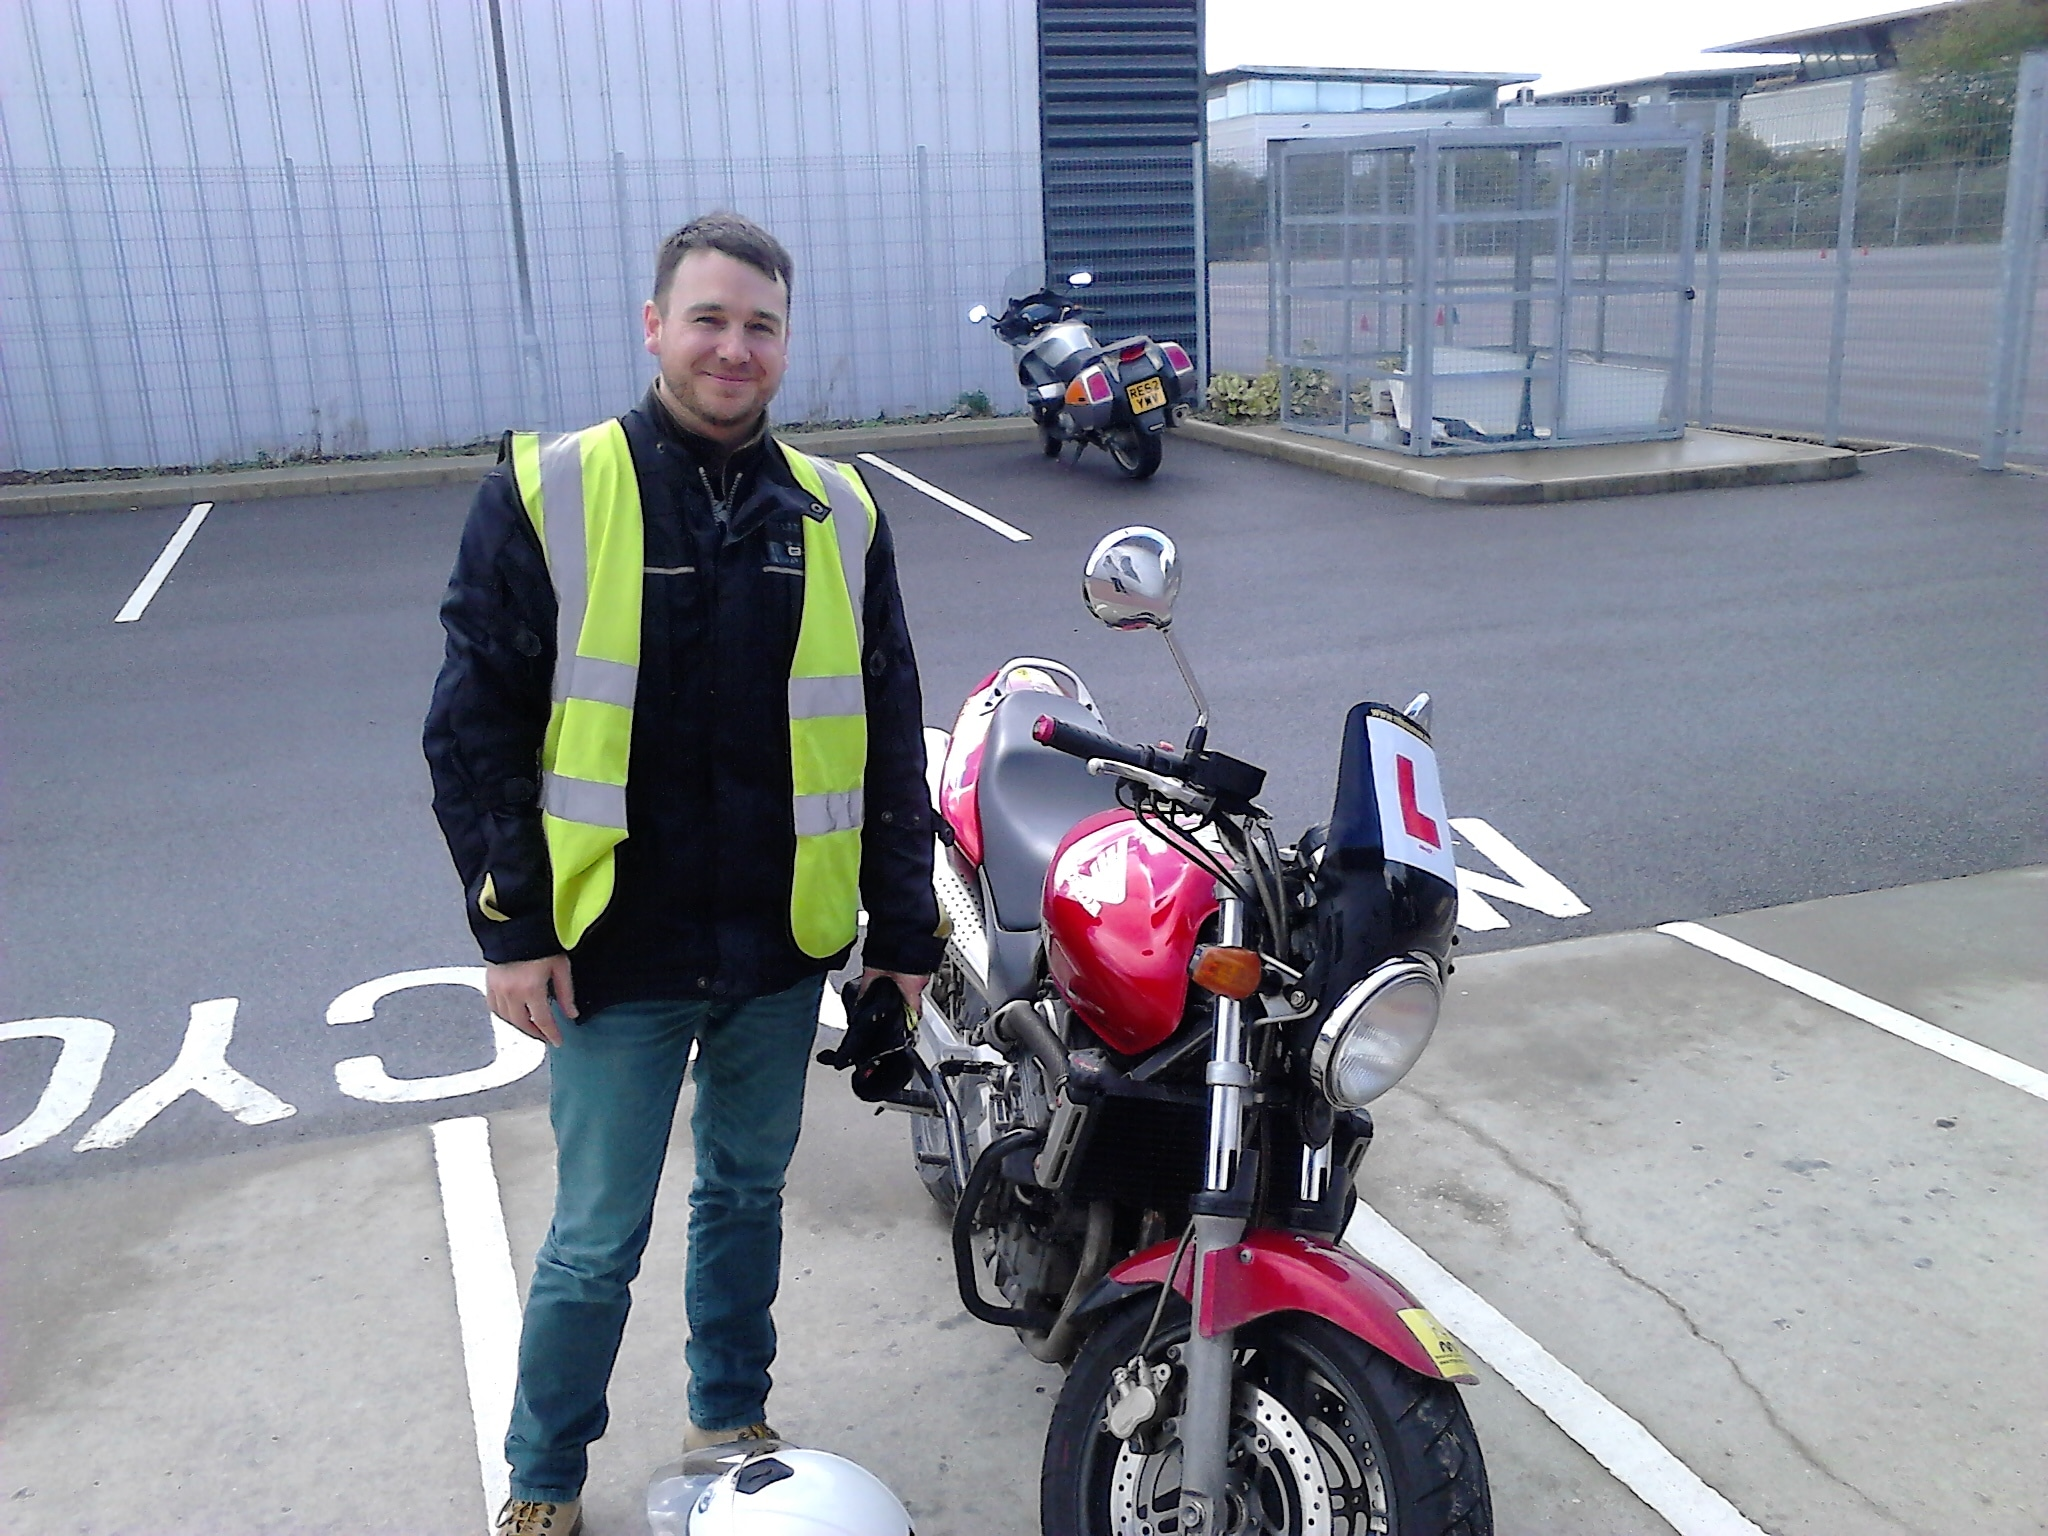 Matt posing with the Honda!